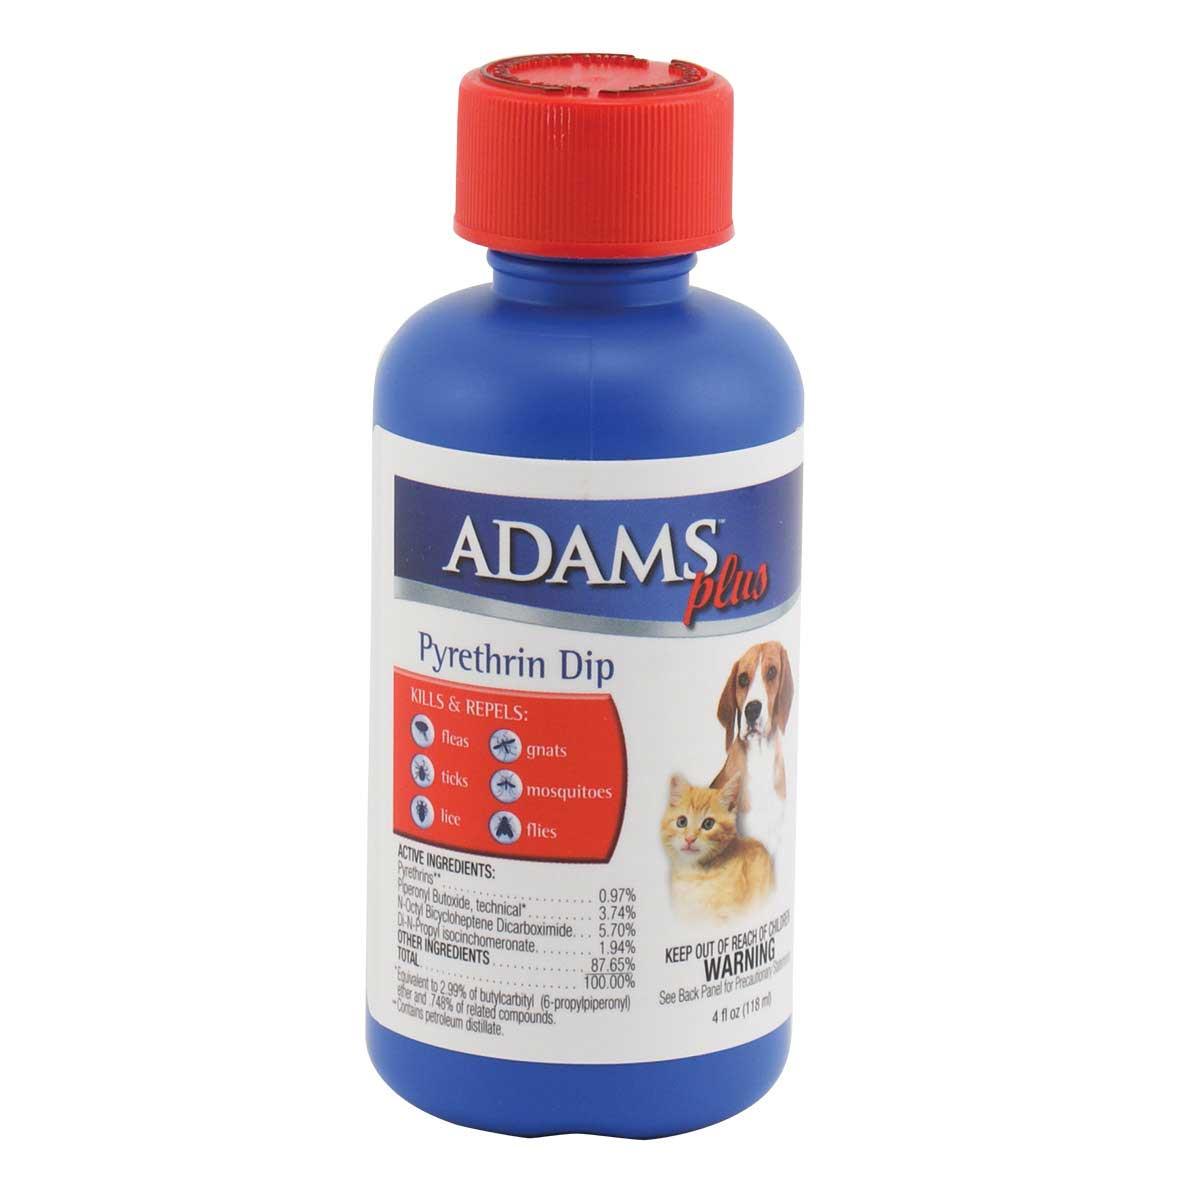 Adams Plus Pyrethrin Dip 4 oz - Kills Fleas and Ticks